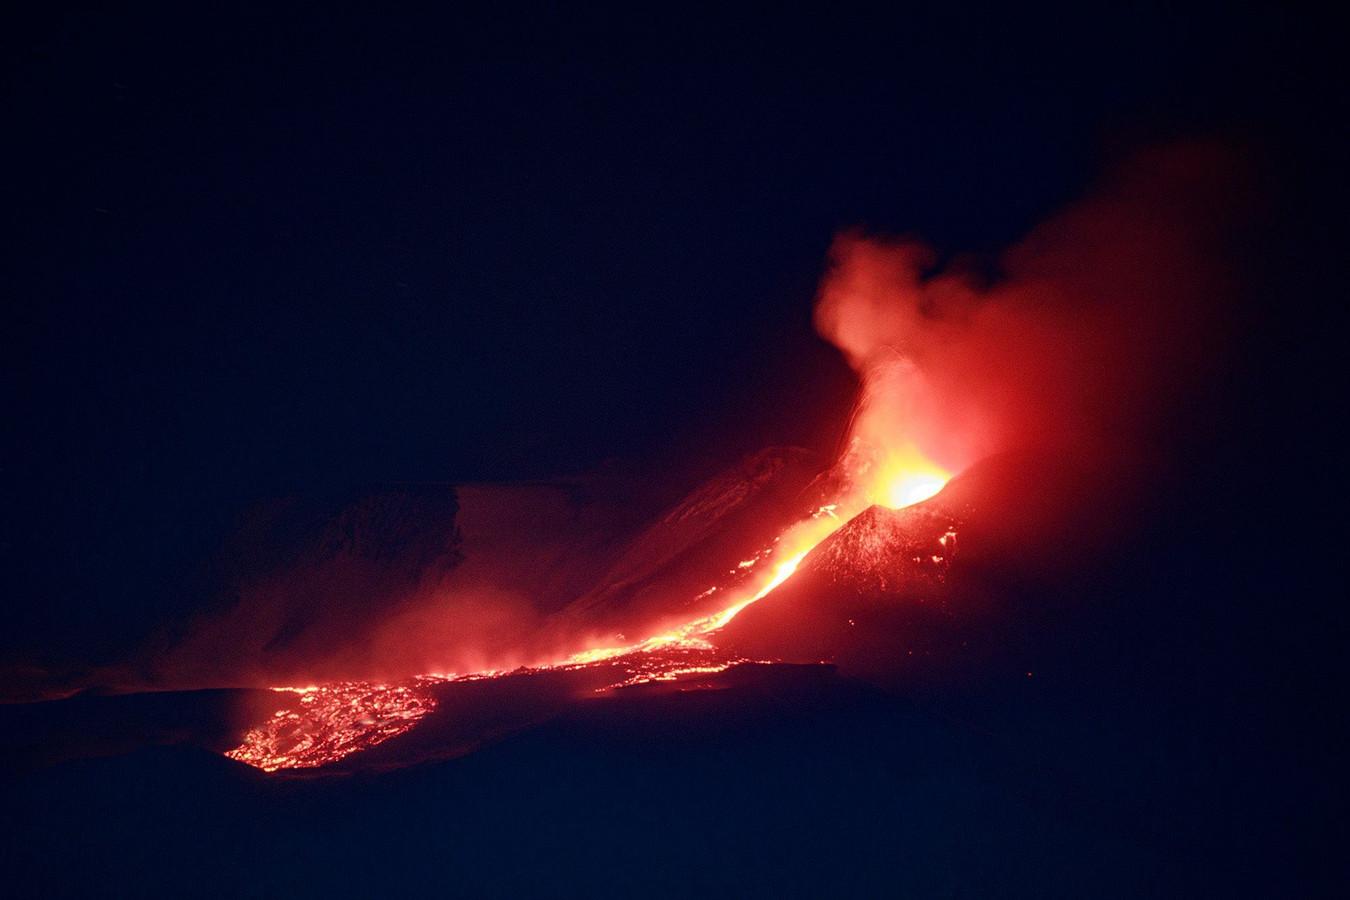 L'Etna illumine le ciel de Sicile.